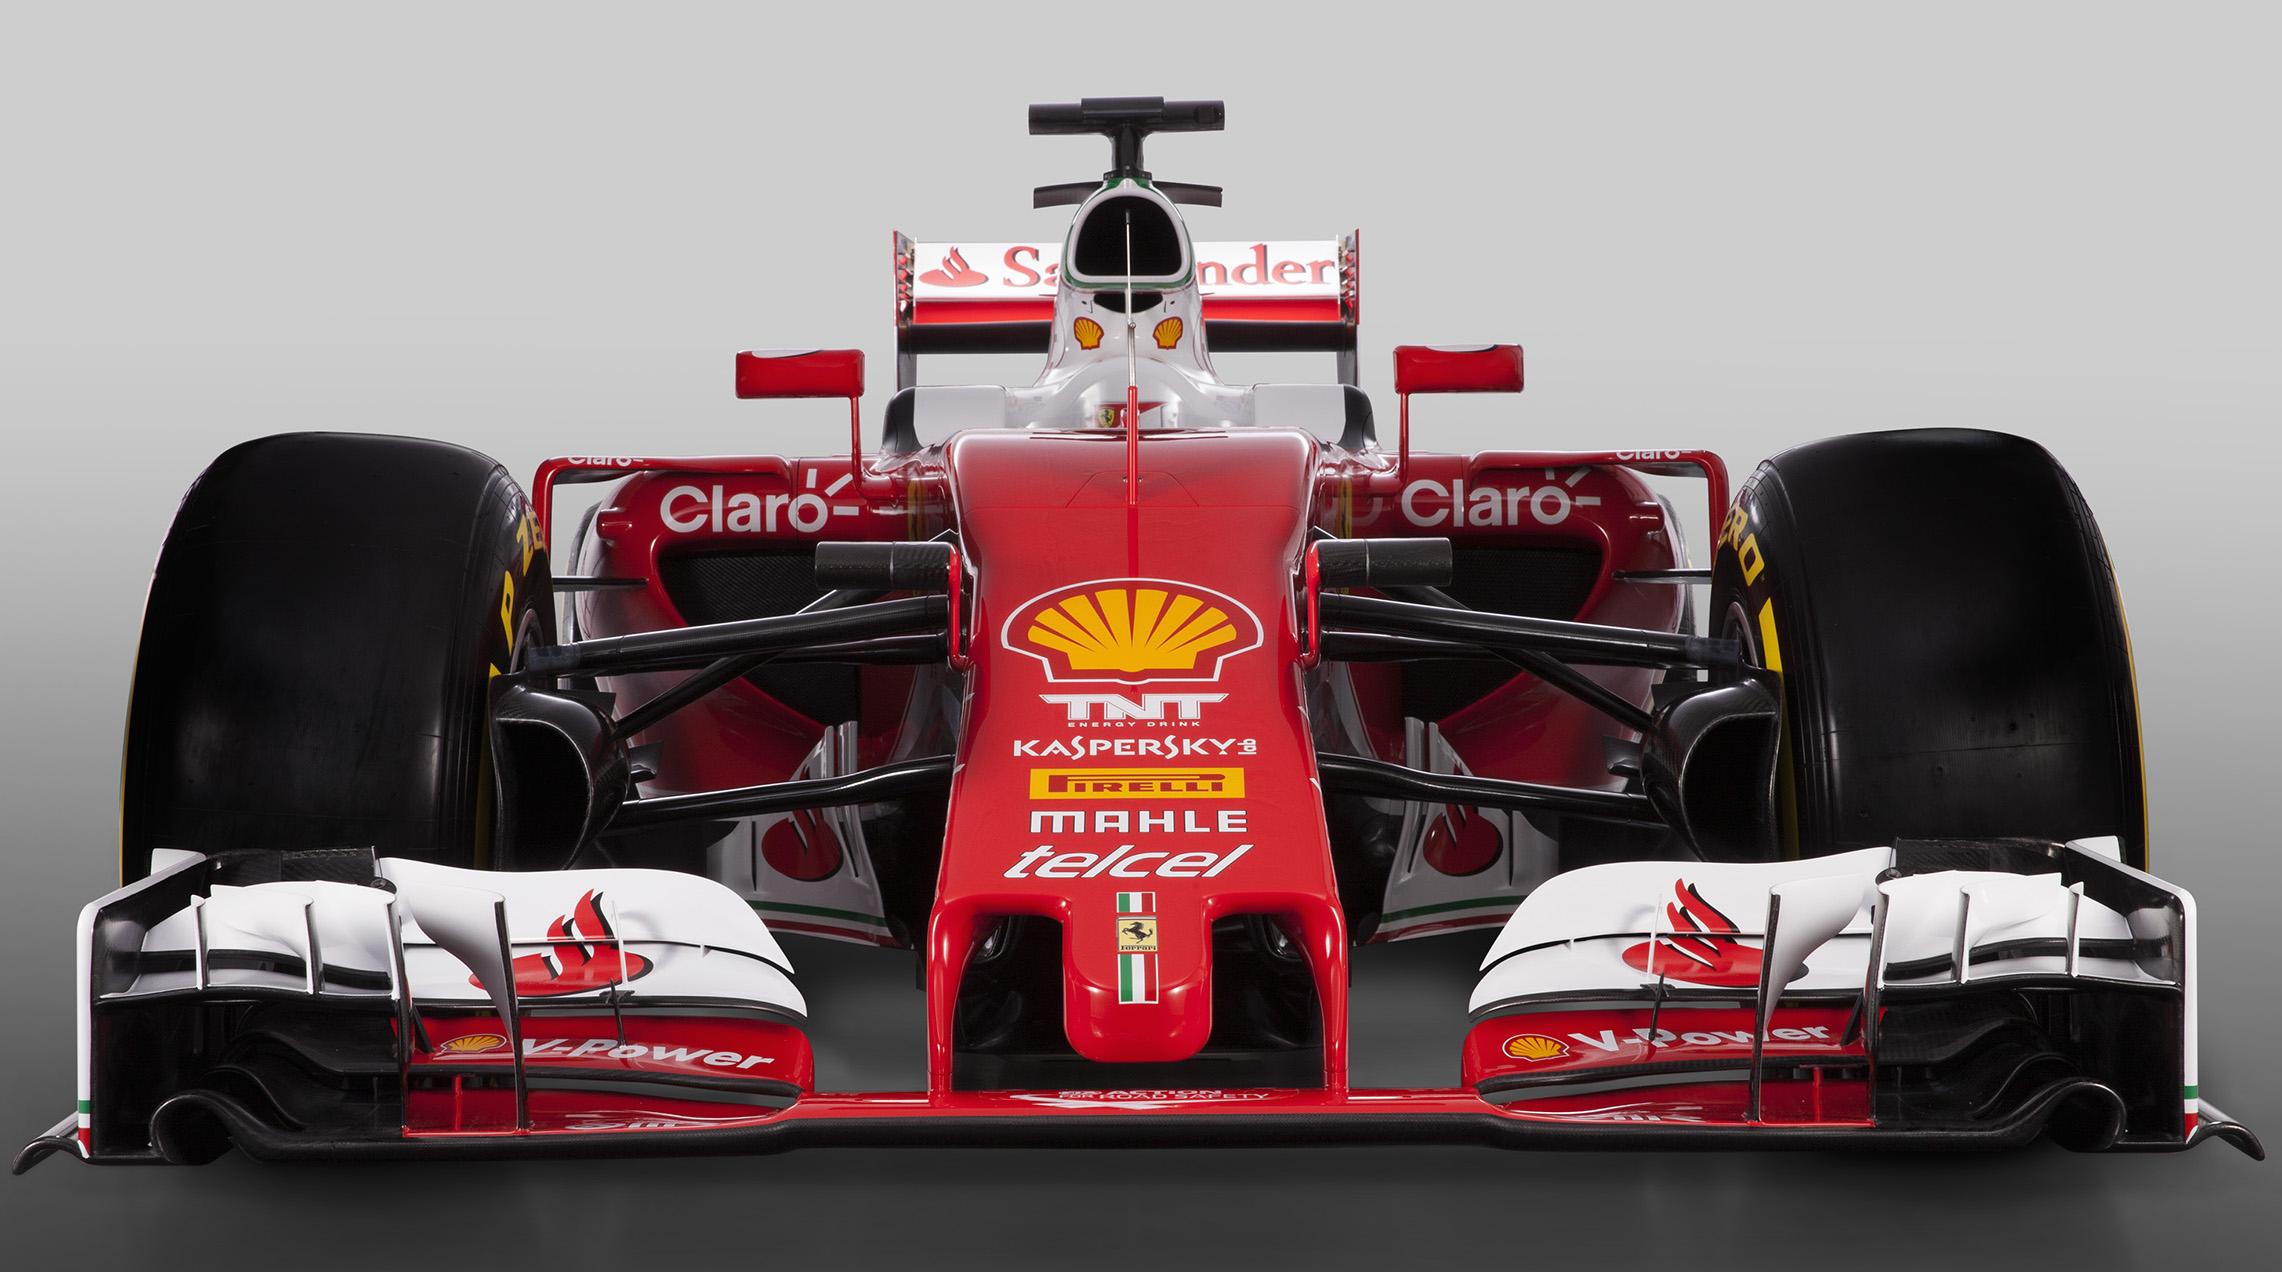 De Ferrari SF-16H, de auto van Kimi Räikkönen en Sebastian Vettel. Foto: Ferrari